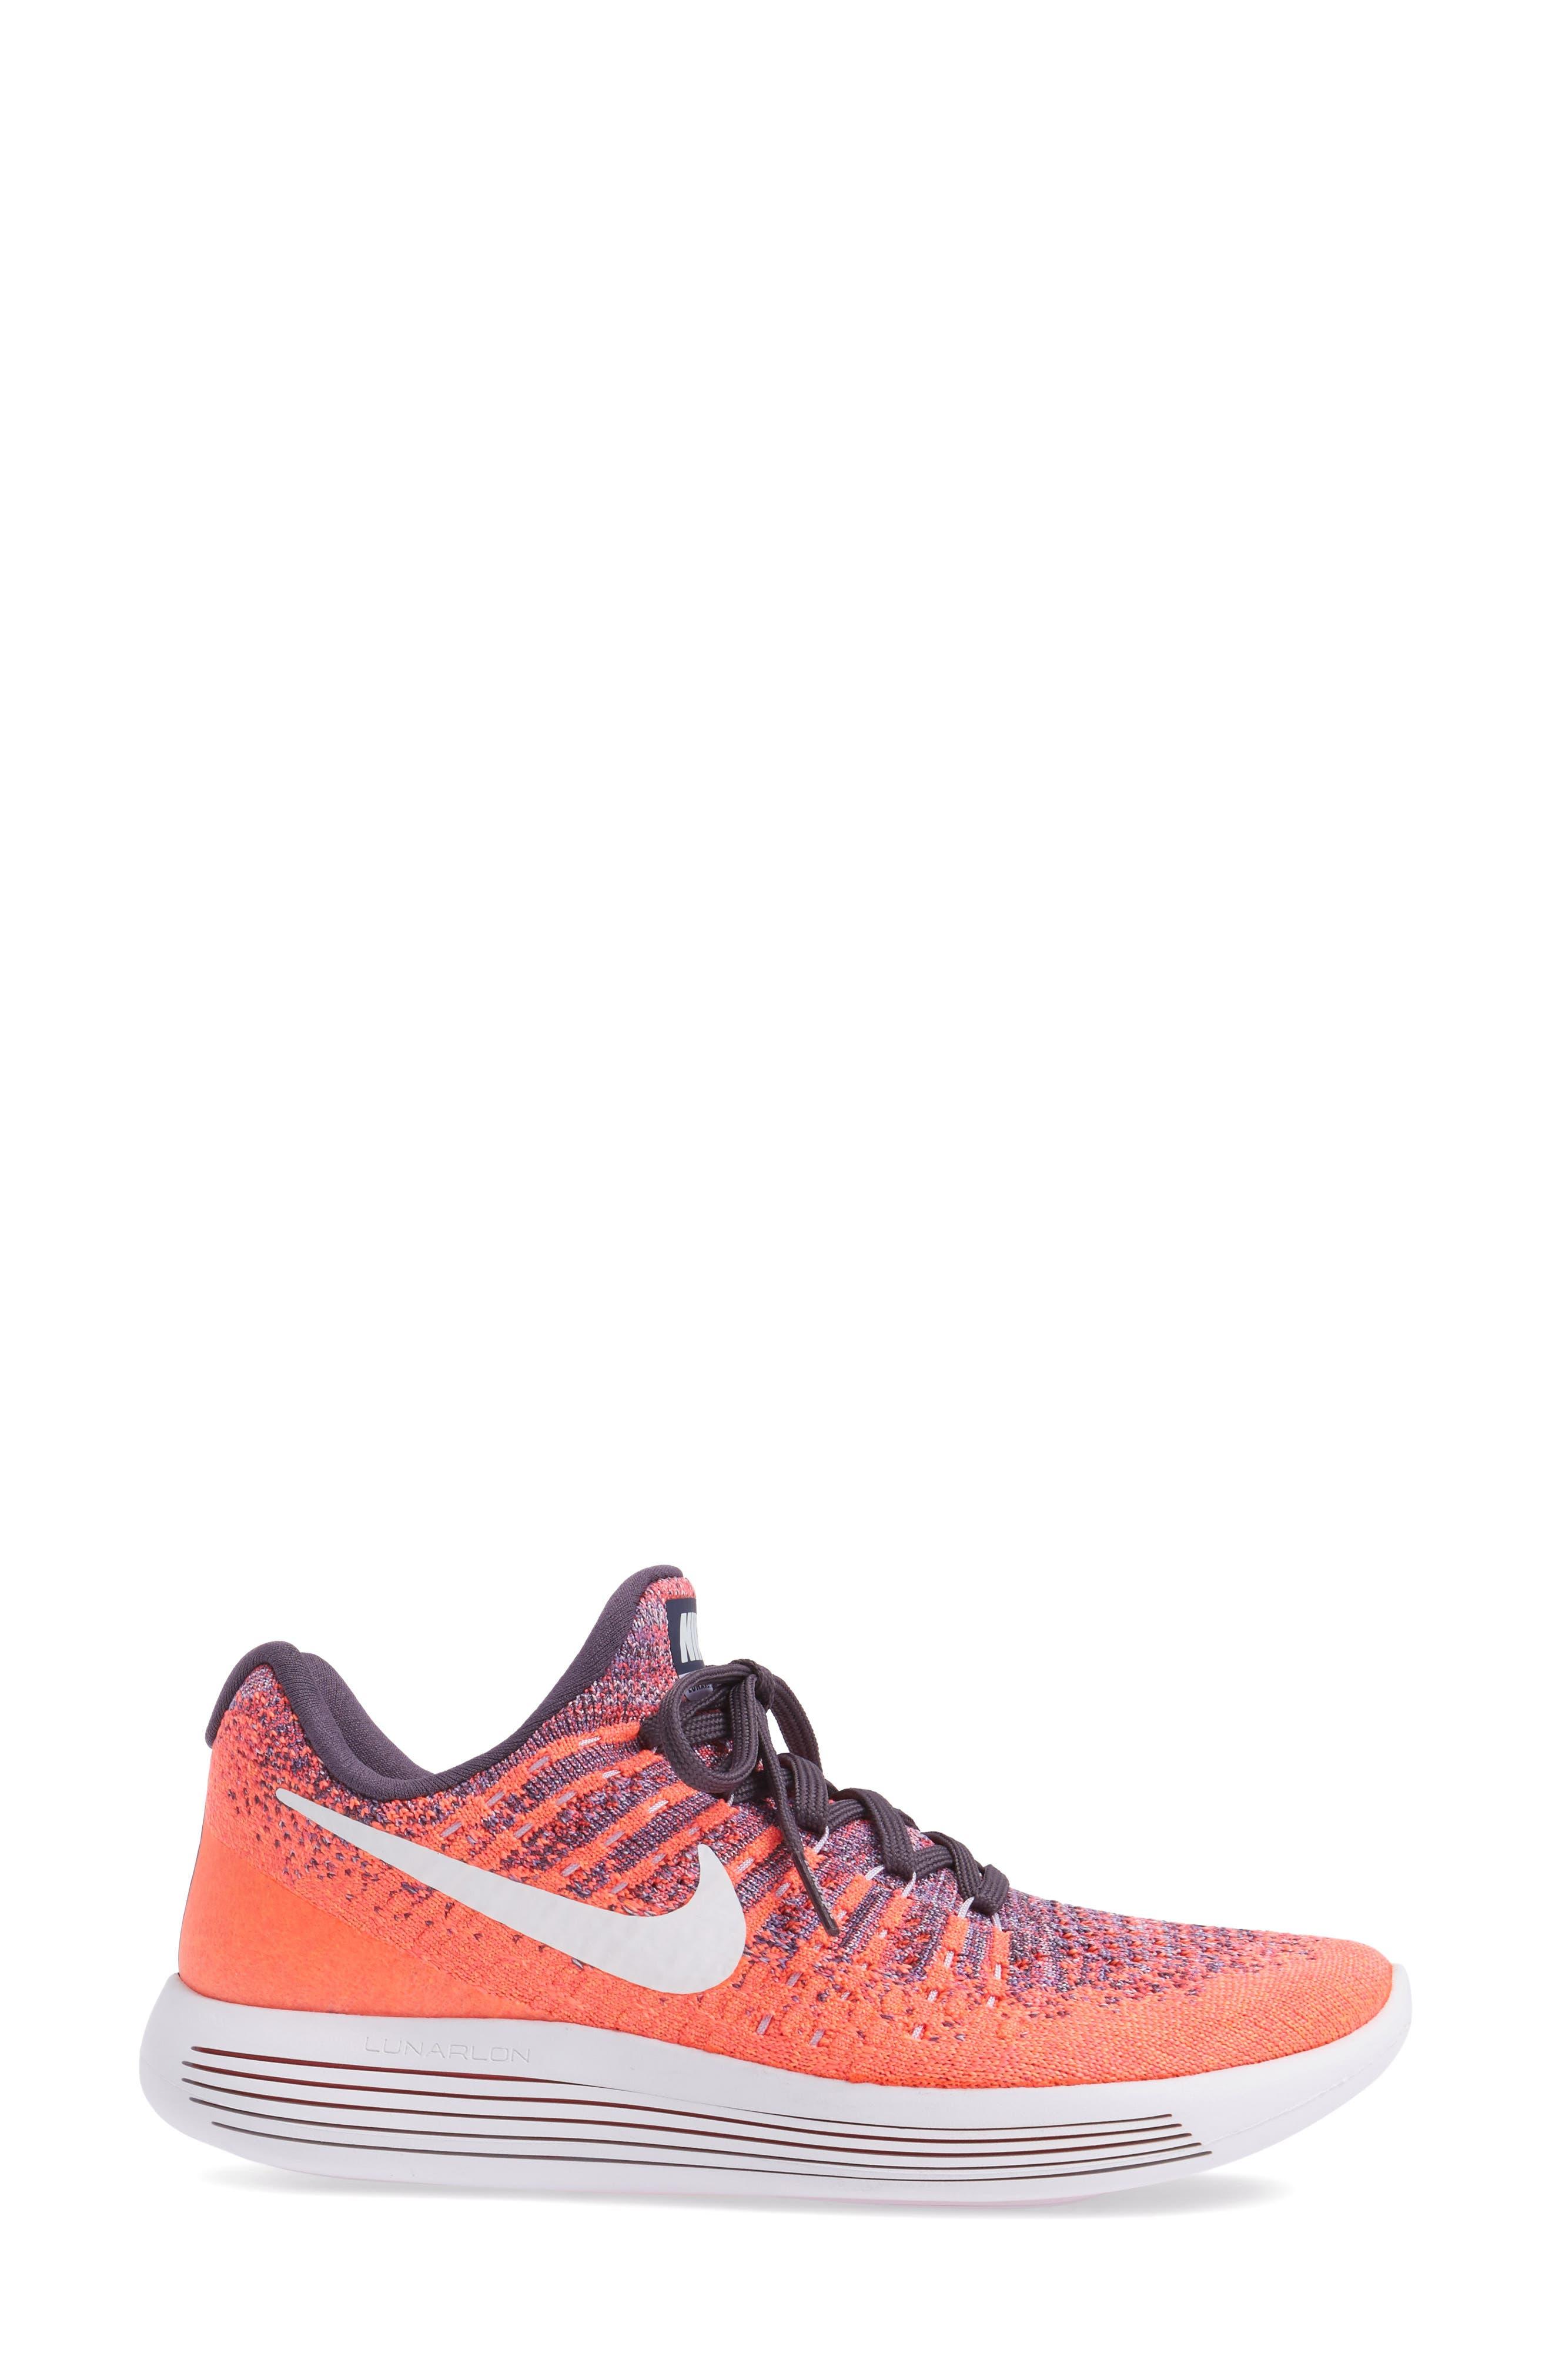 LunarEpic Low Flyknit 2 Running Shoe,                             Alternate thumbnail 57, color,